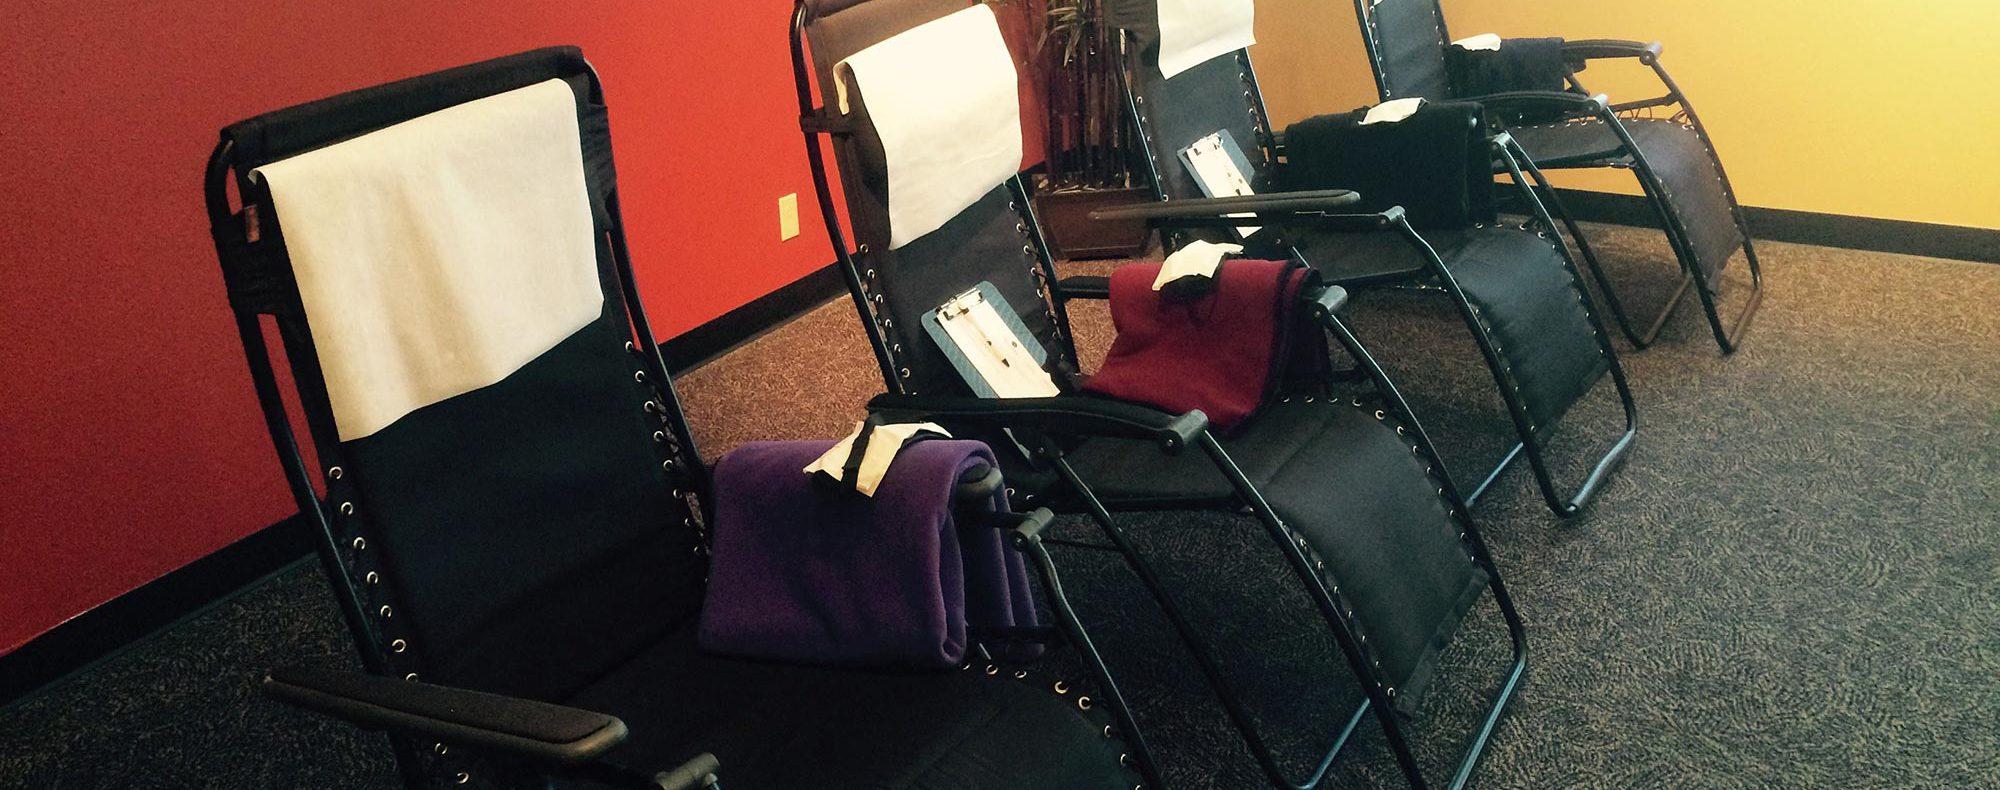 Community Acupuncture Portland